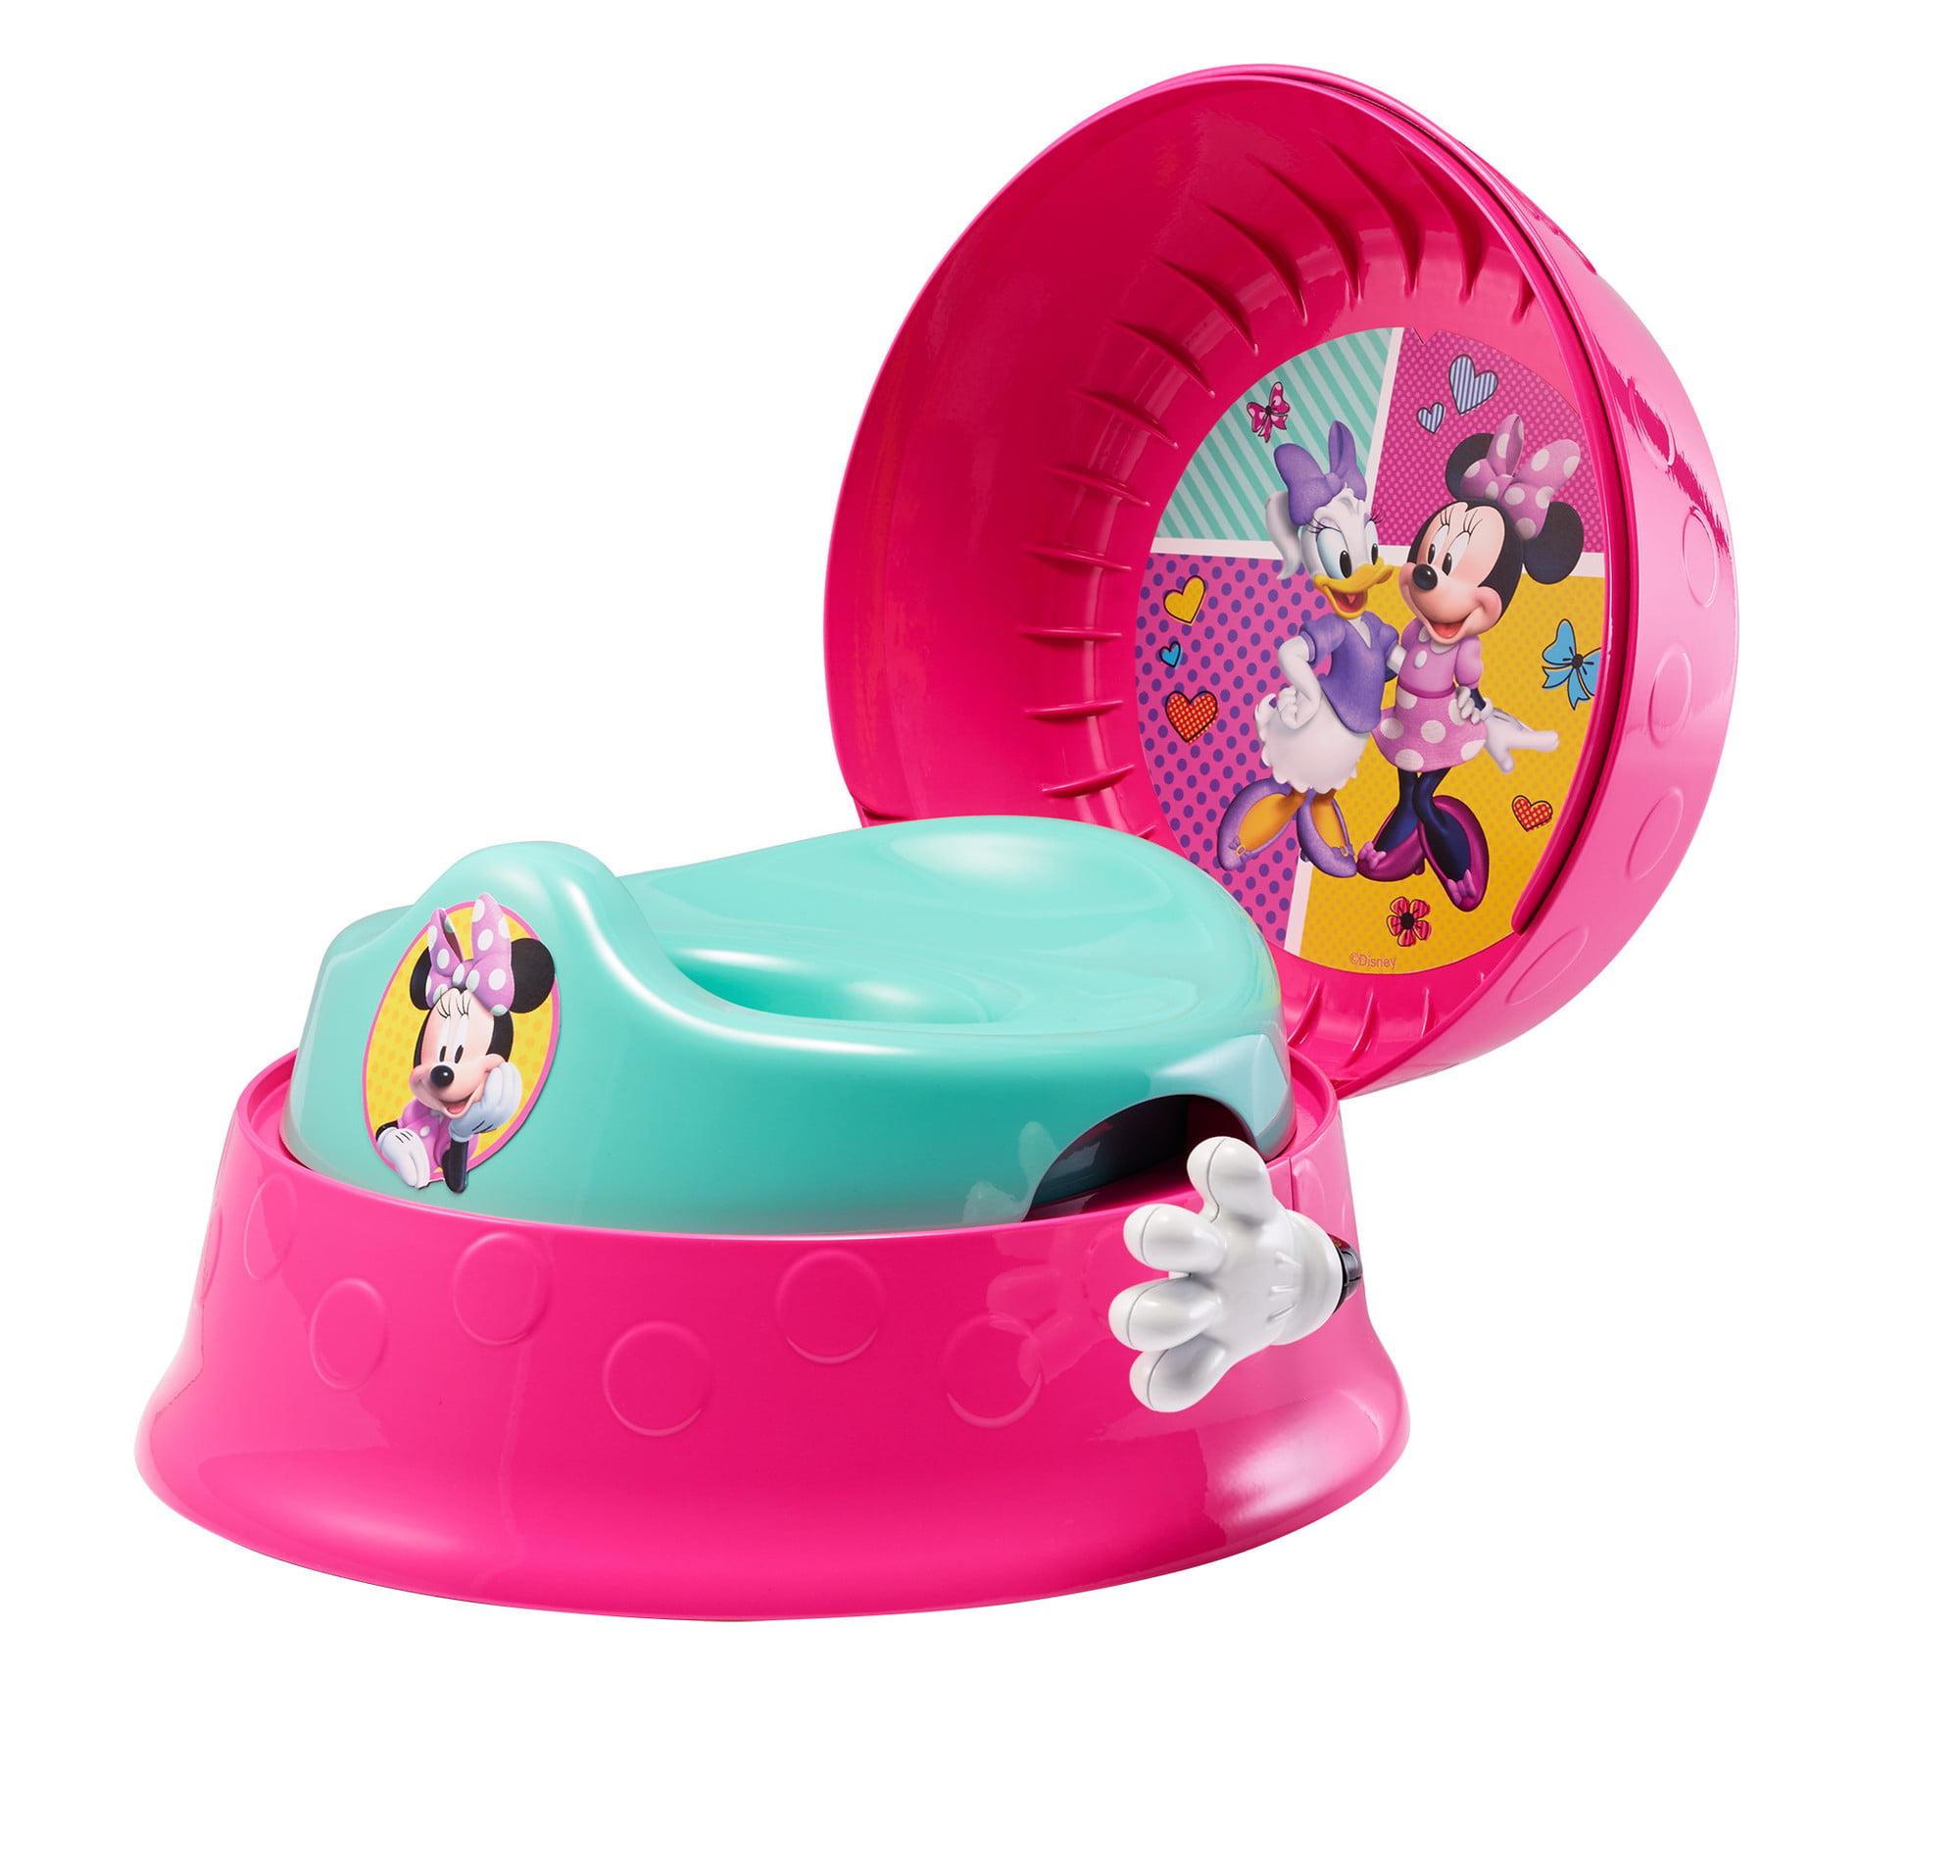 Disney Minnie Mouse 3-in-1 Potty Training Toilet, Toddler Toilet Training Set